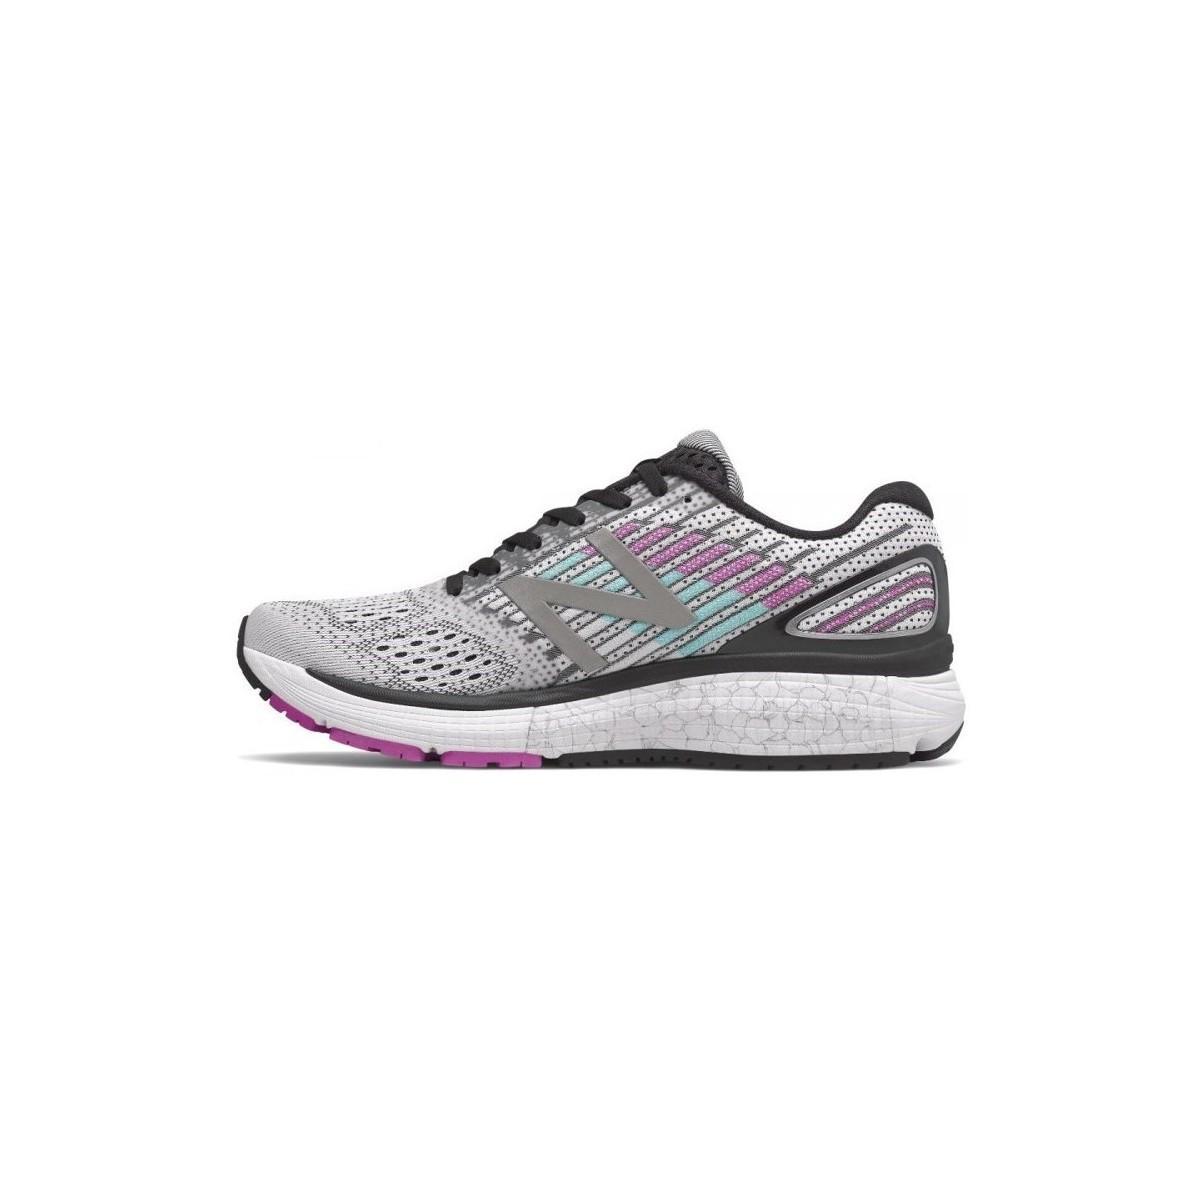 860 Multicolour Lyst New ShoestrainersIn Balance Women's b7yYgvf6